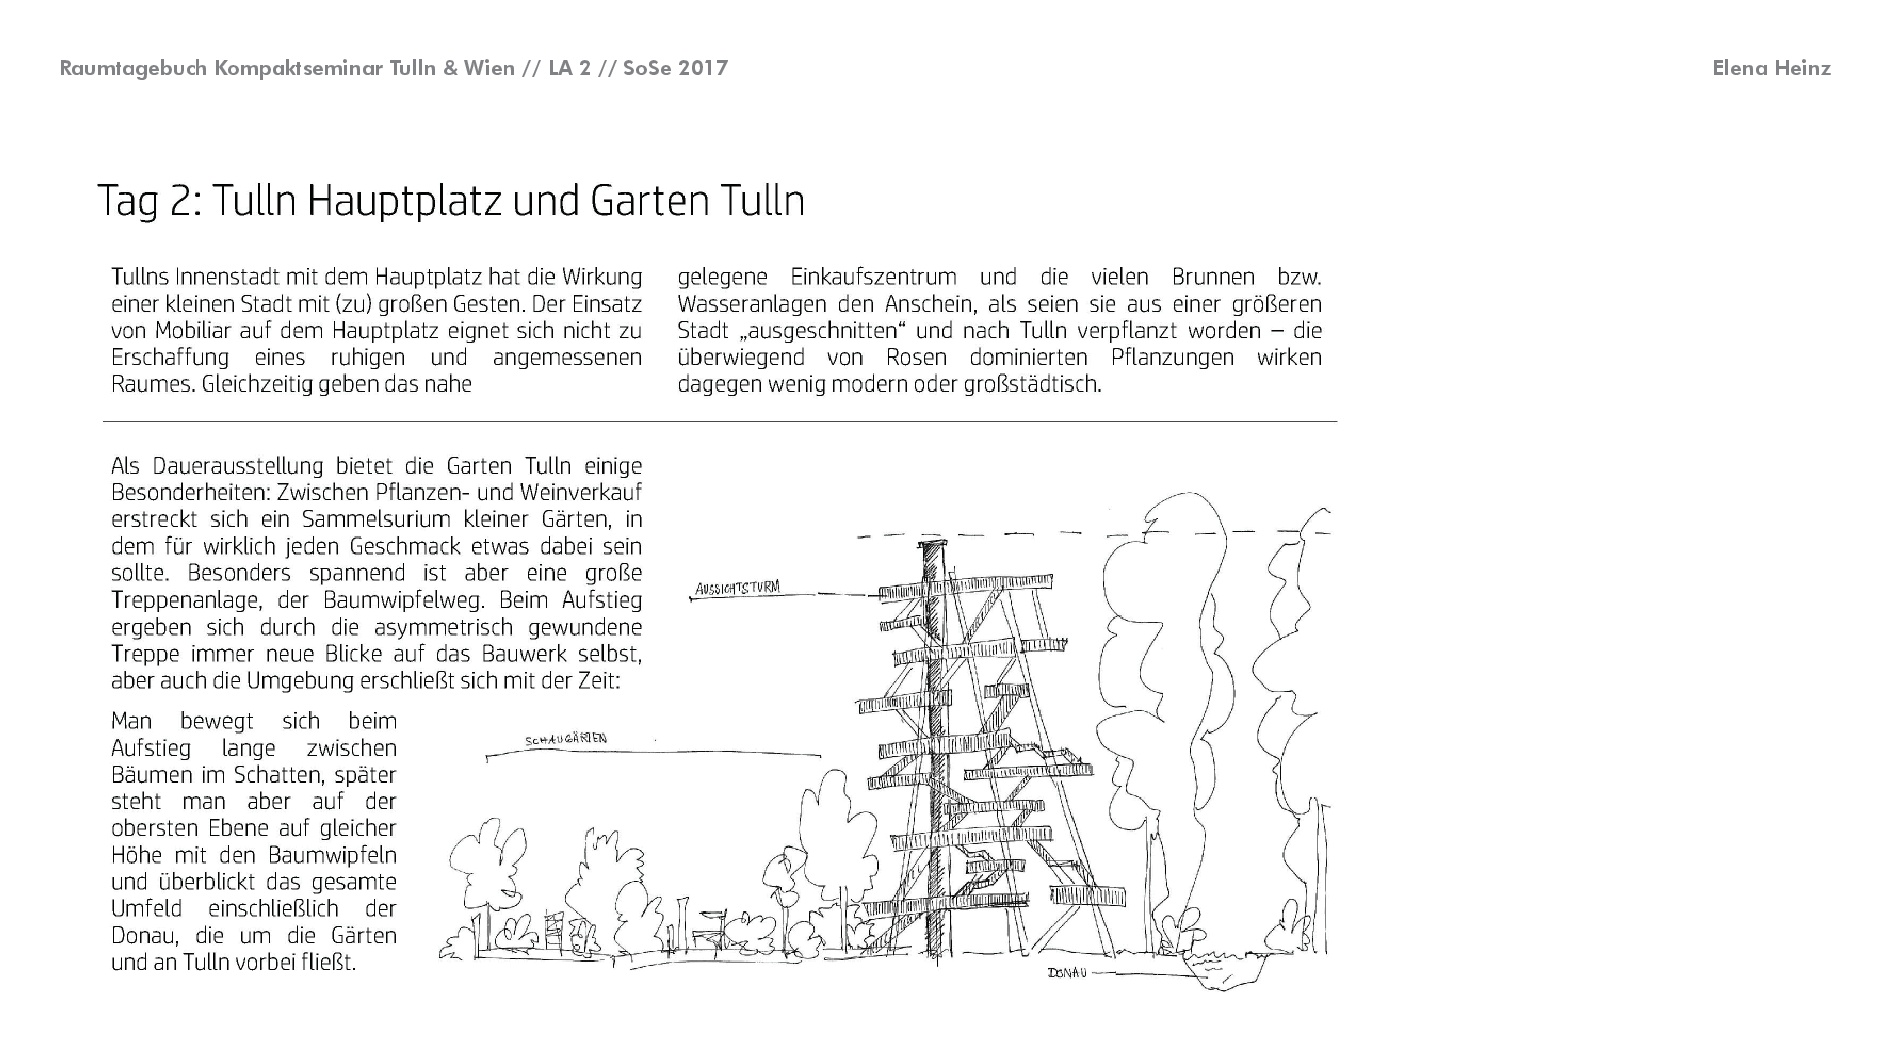 NEU Screen Raumtagebuch Tulln Wien SoSe 17 018